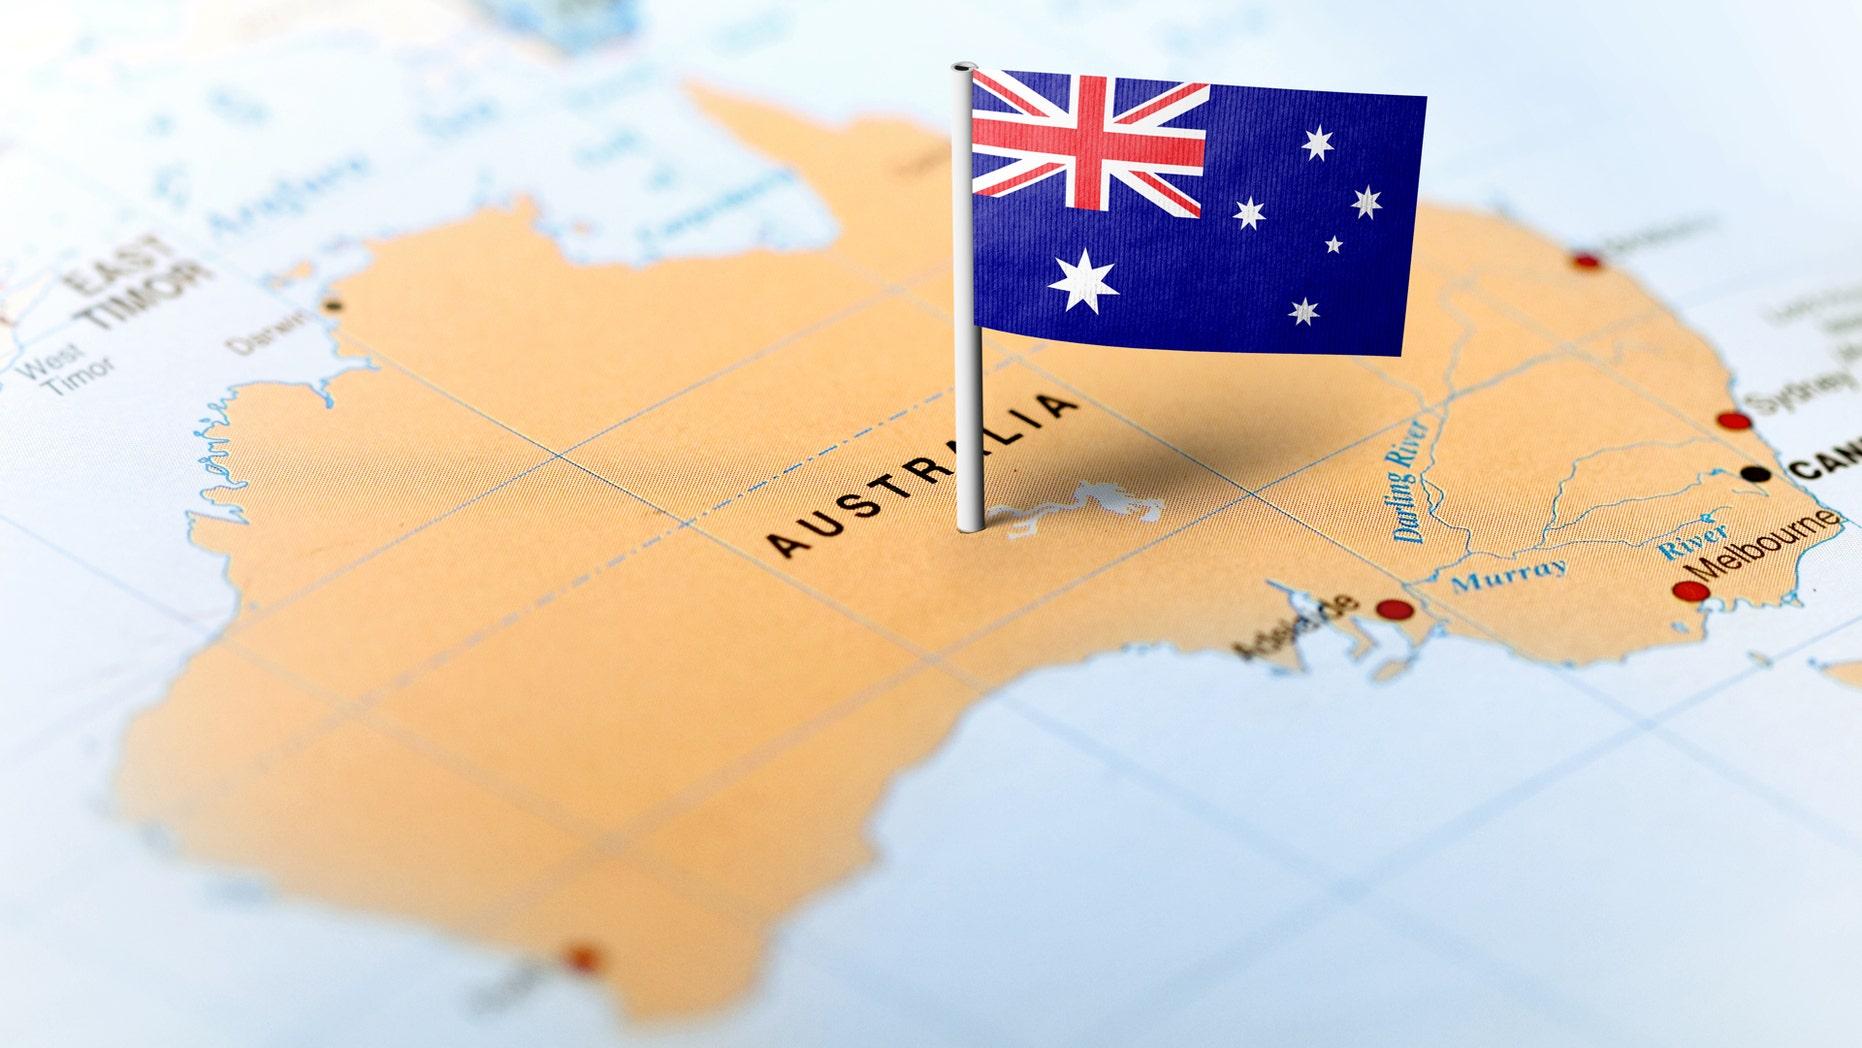 The flag of Australia pinned on the map. Horizontal orientation. Macro photography.  (MarkRubens, iStock)